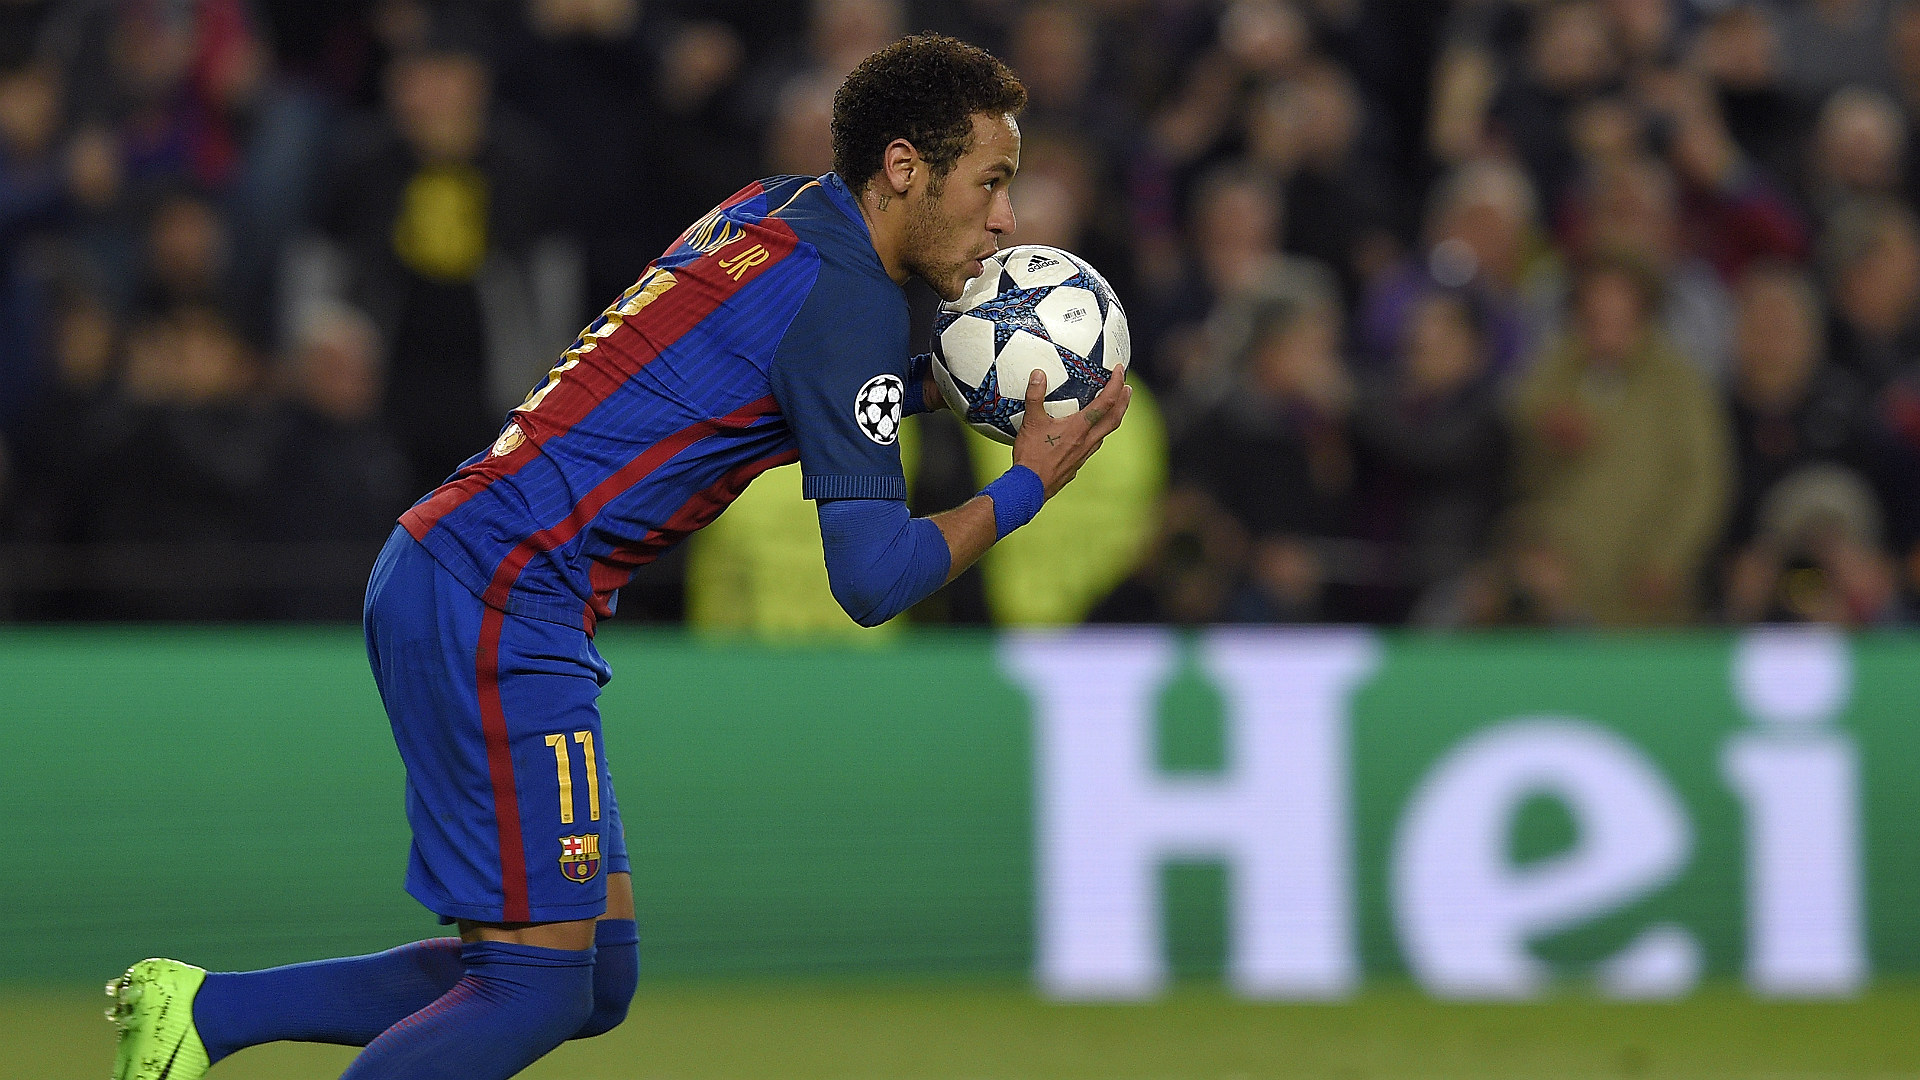 neymar-barcelona-psg-uefa-champions-league-08032016_7alexpfkeelz1afuiu160mwh5